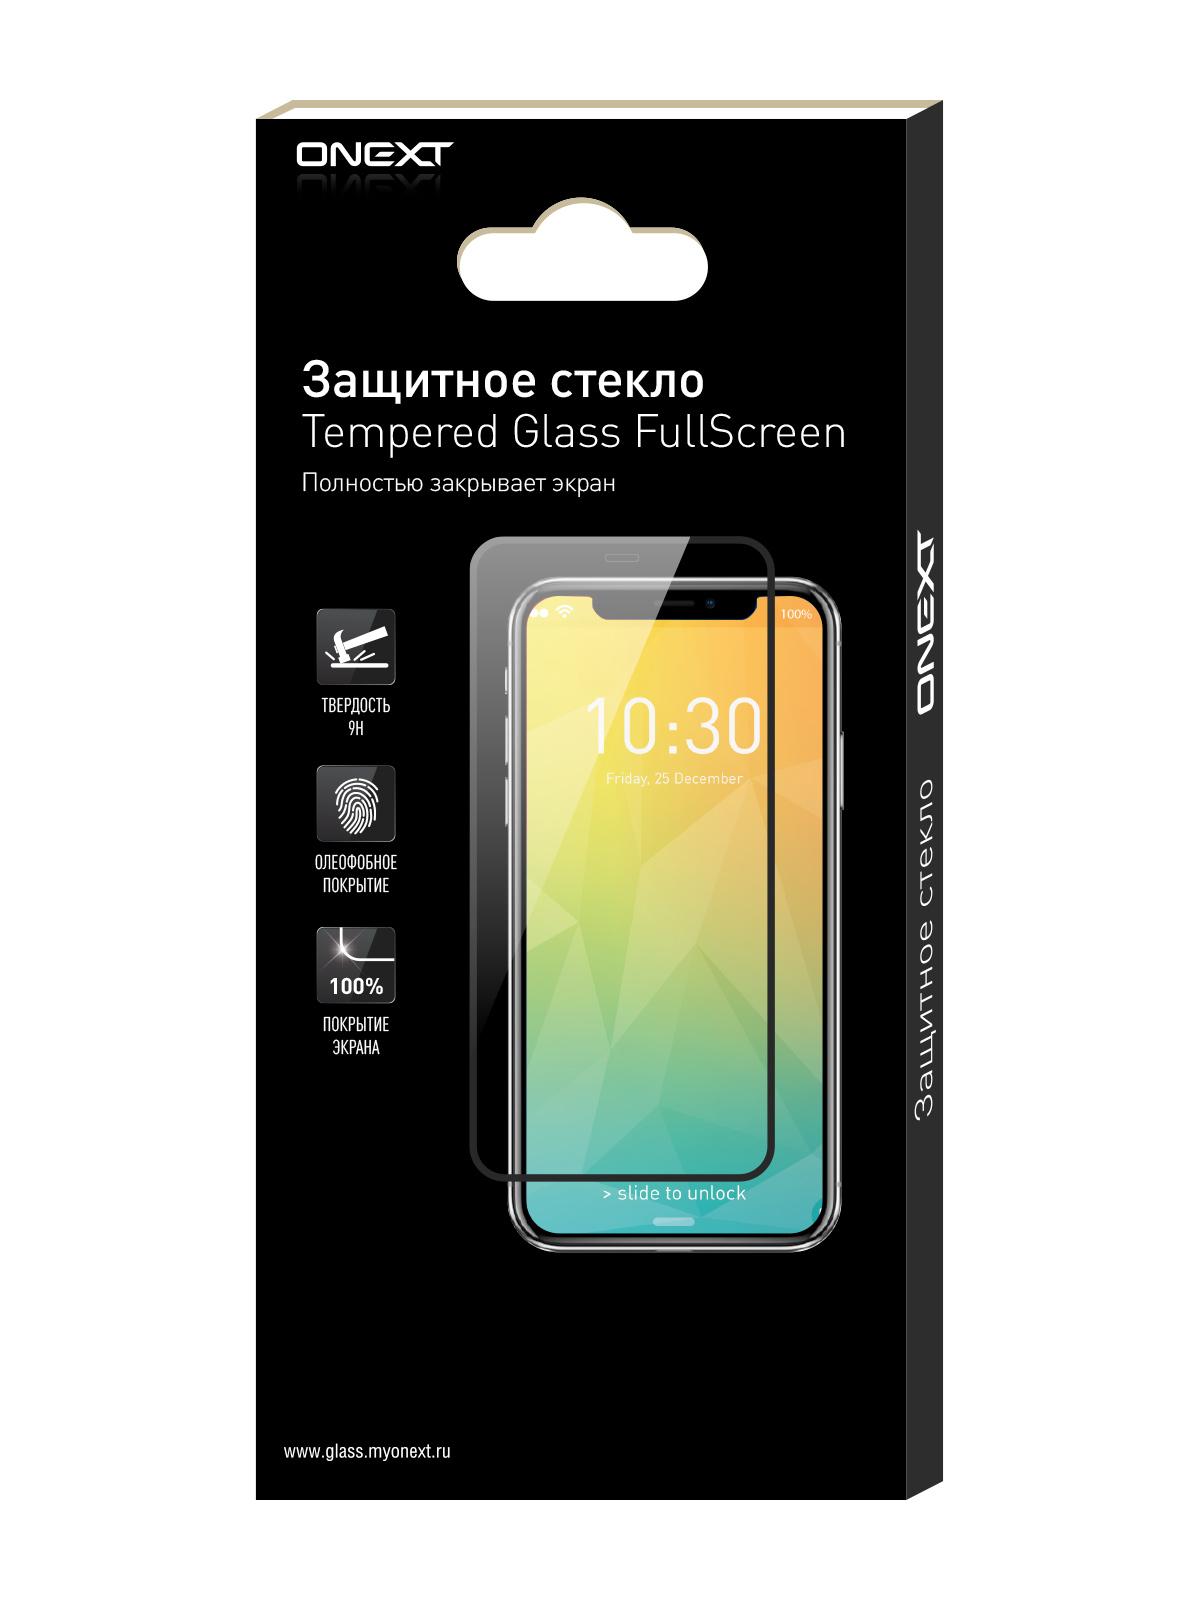 Защитное стекло ONEXT для Asus ZenFone Max Plus M1 Black